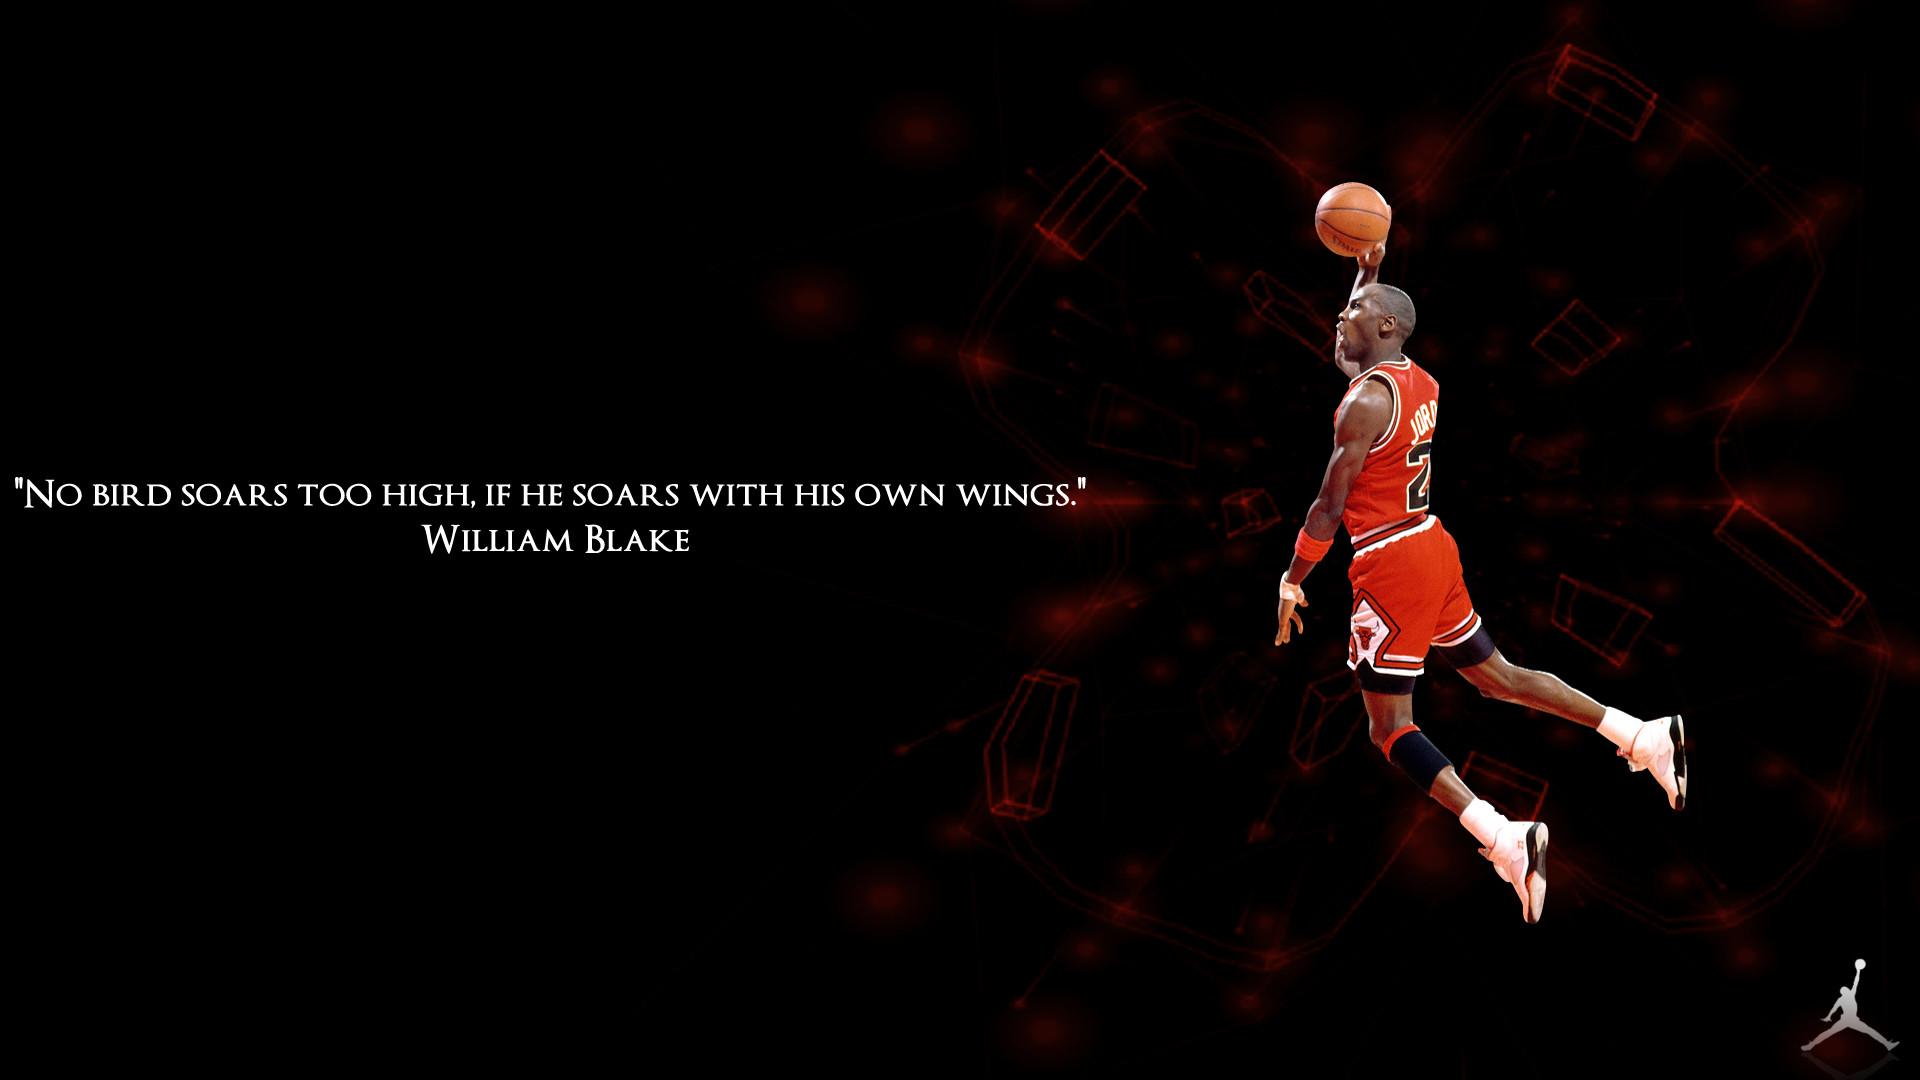 Michael Jordan Quote Wallpaper (77+ pictures)